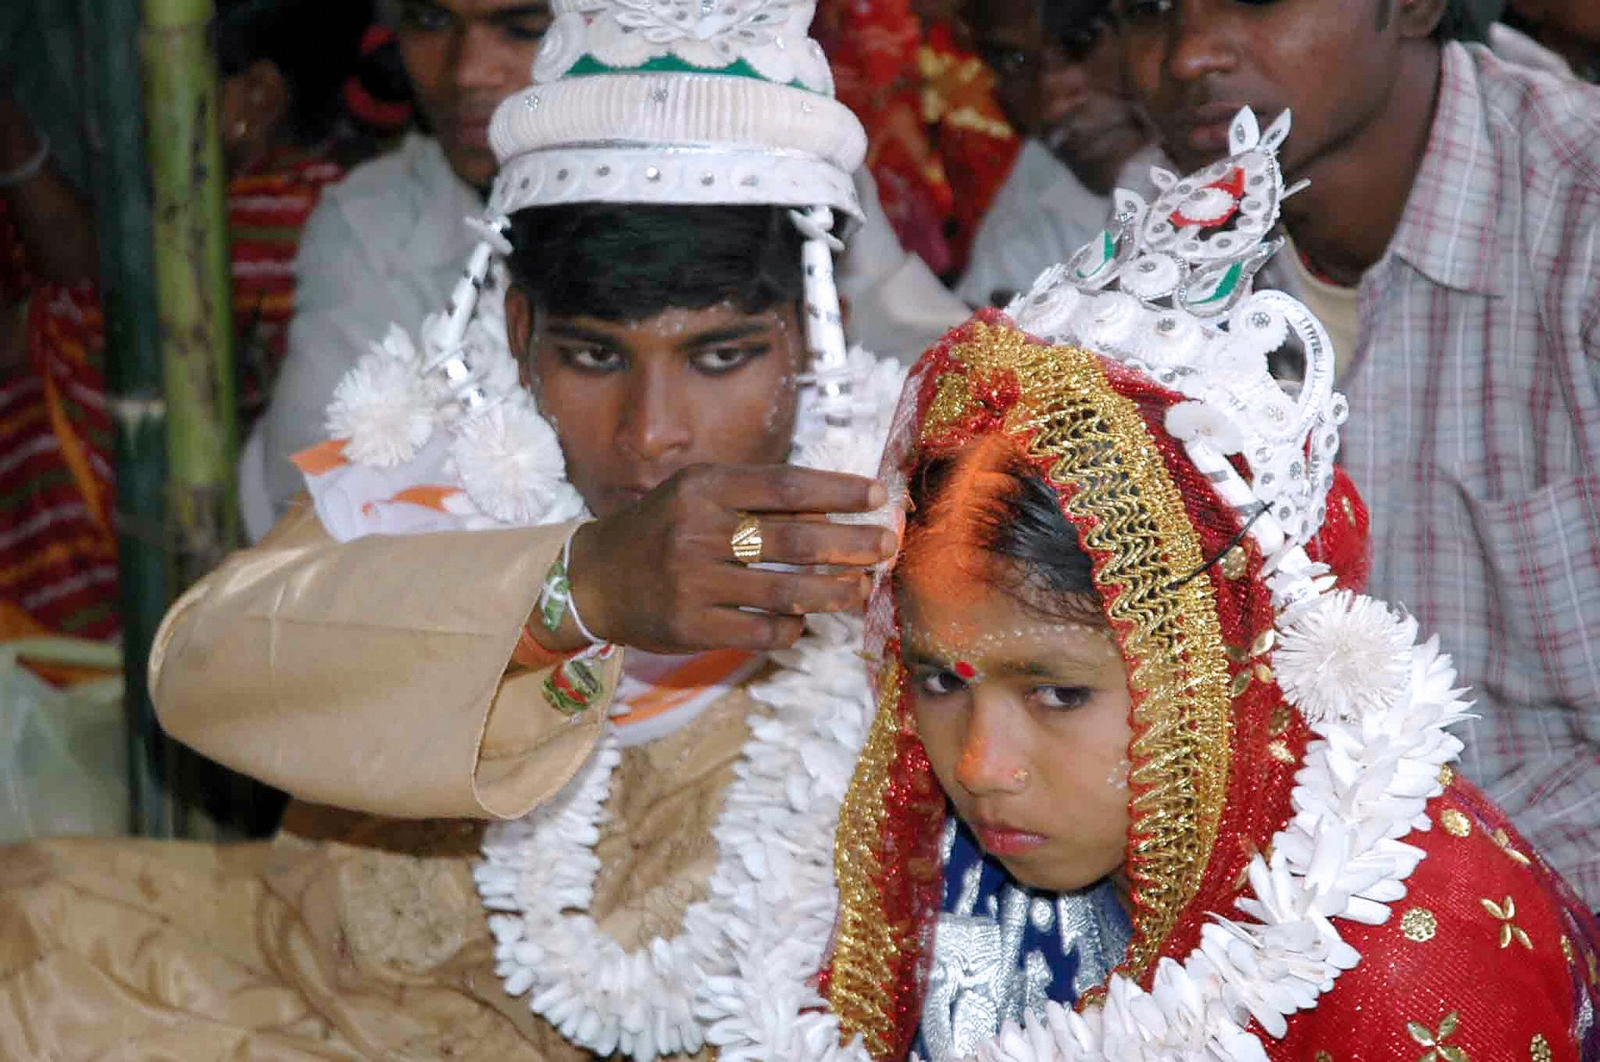 India child marriage